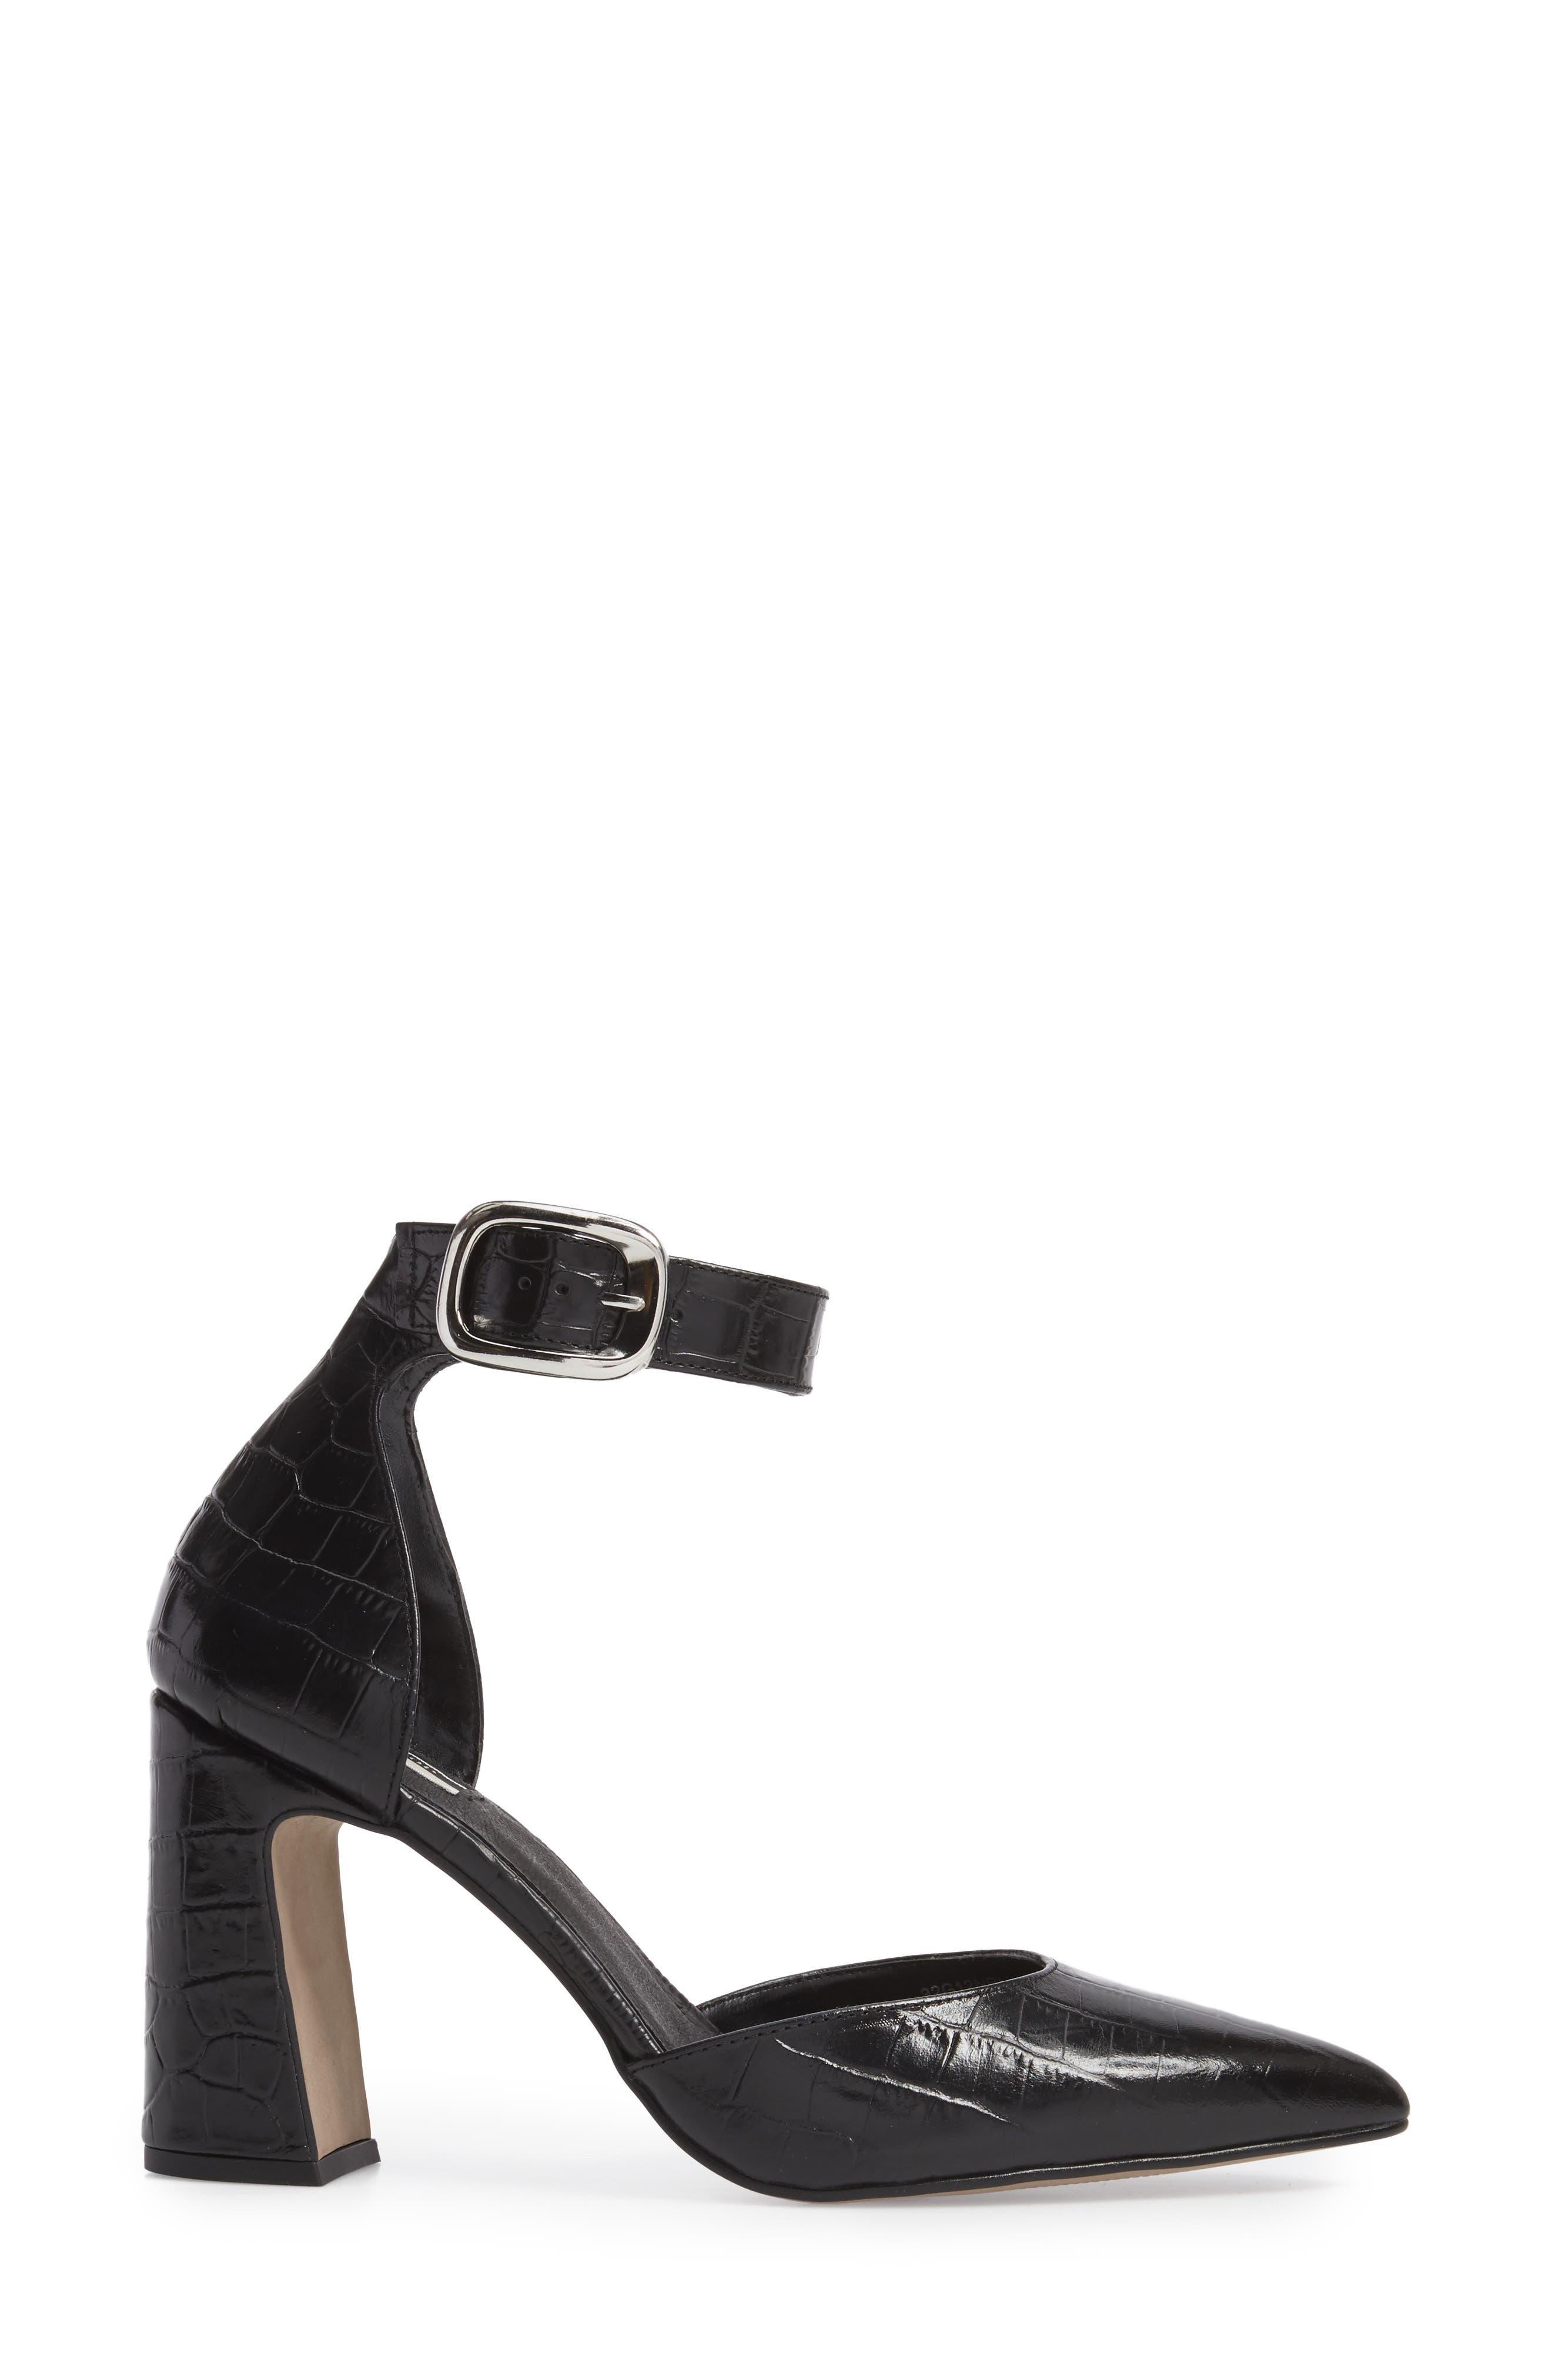 Geisha Ankle Strap Pump,                             Alternate thumbnail 3, color,                             Black